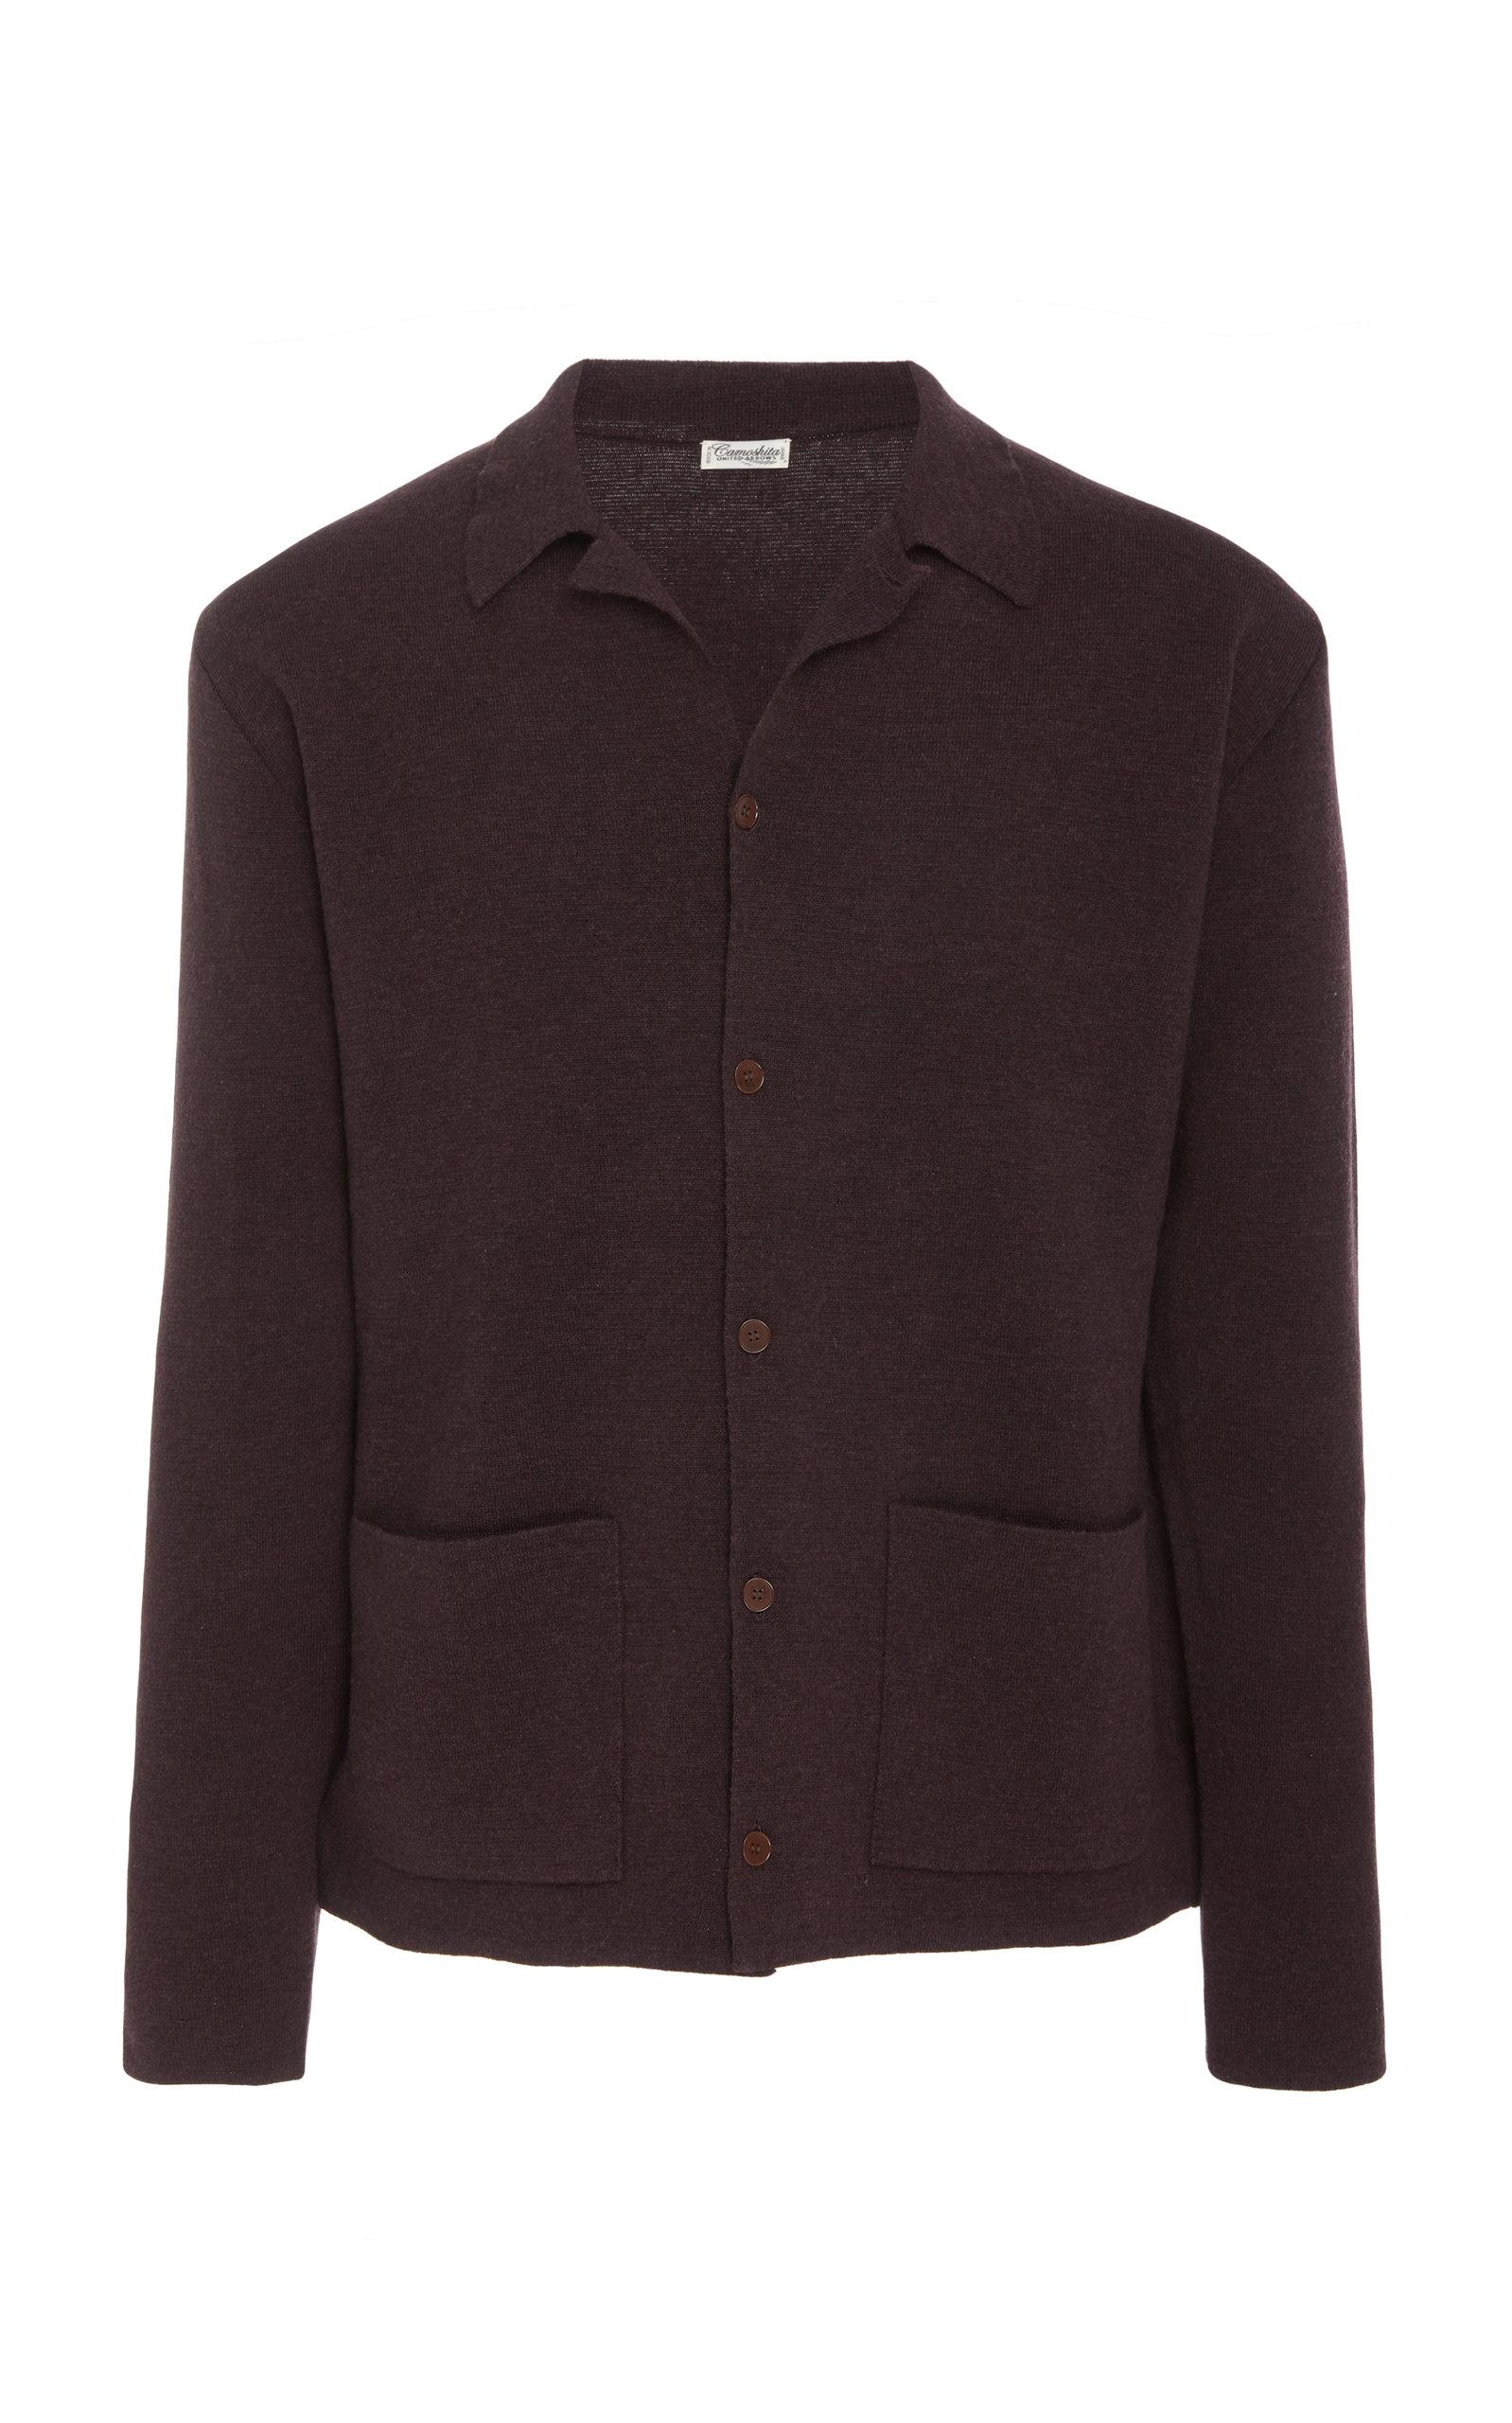 CAMOSHITA Knit Polo Cardigan Sweater in Burgundy